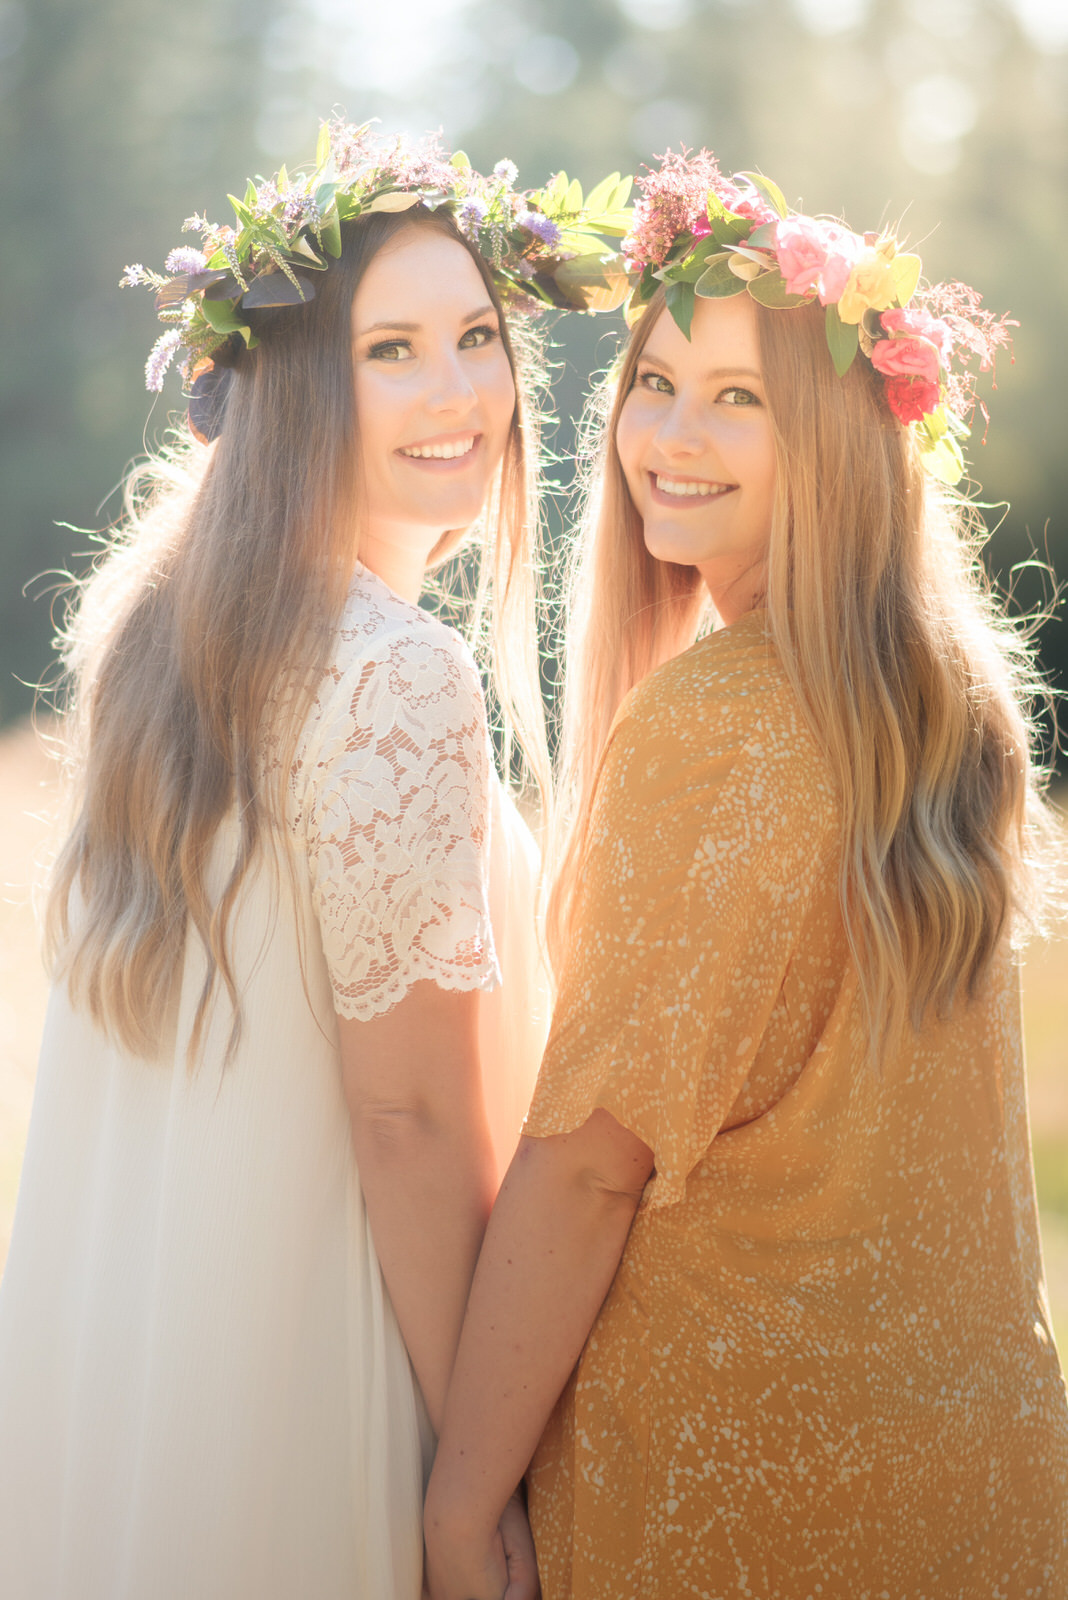 Sisters Portrait Grand Forest Bainbridge Island Bohemian Floral Crown.jpg